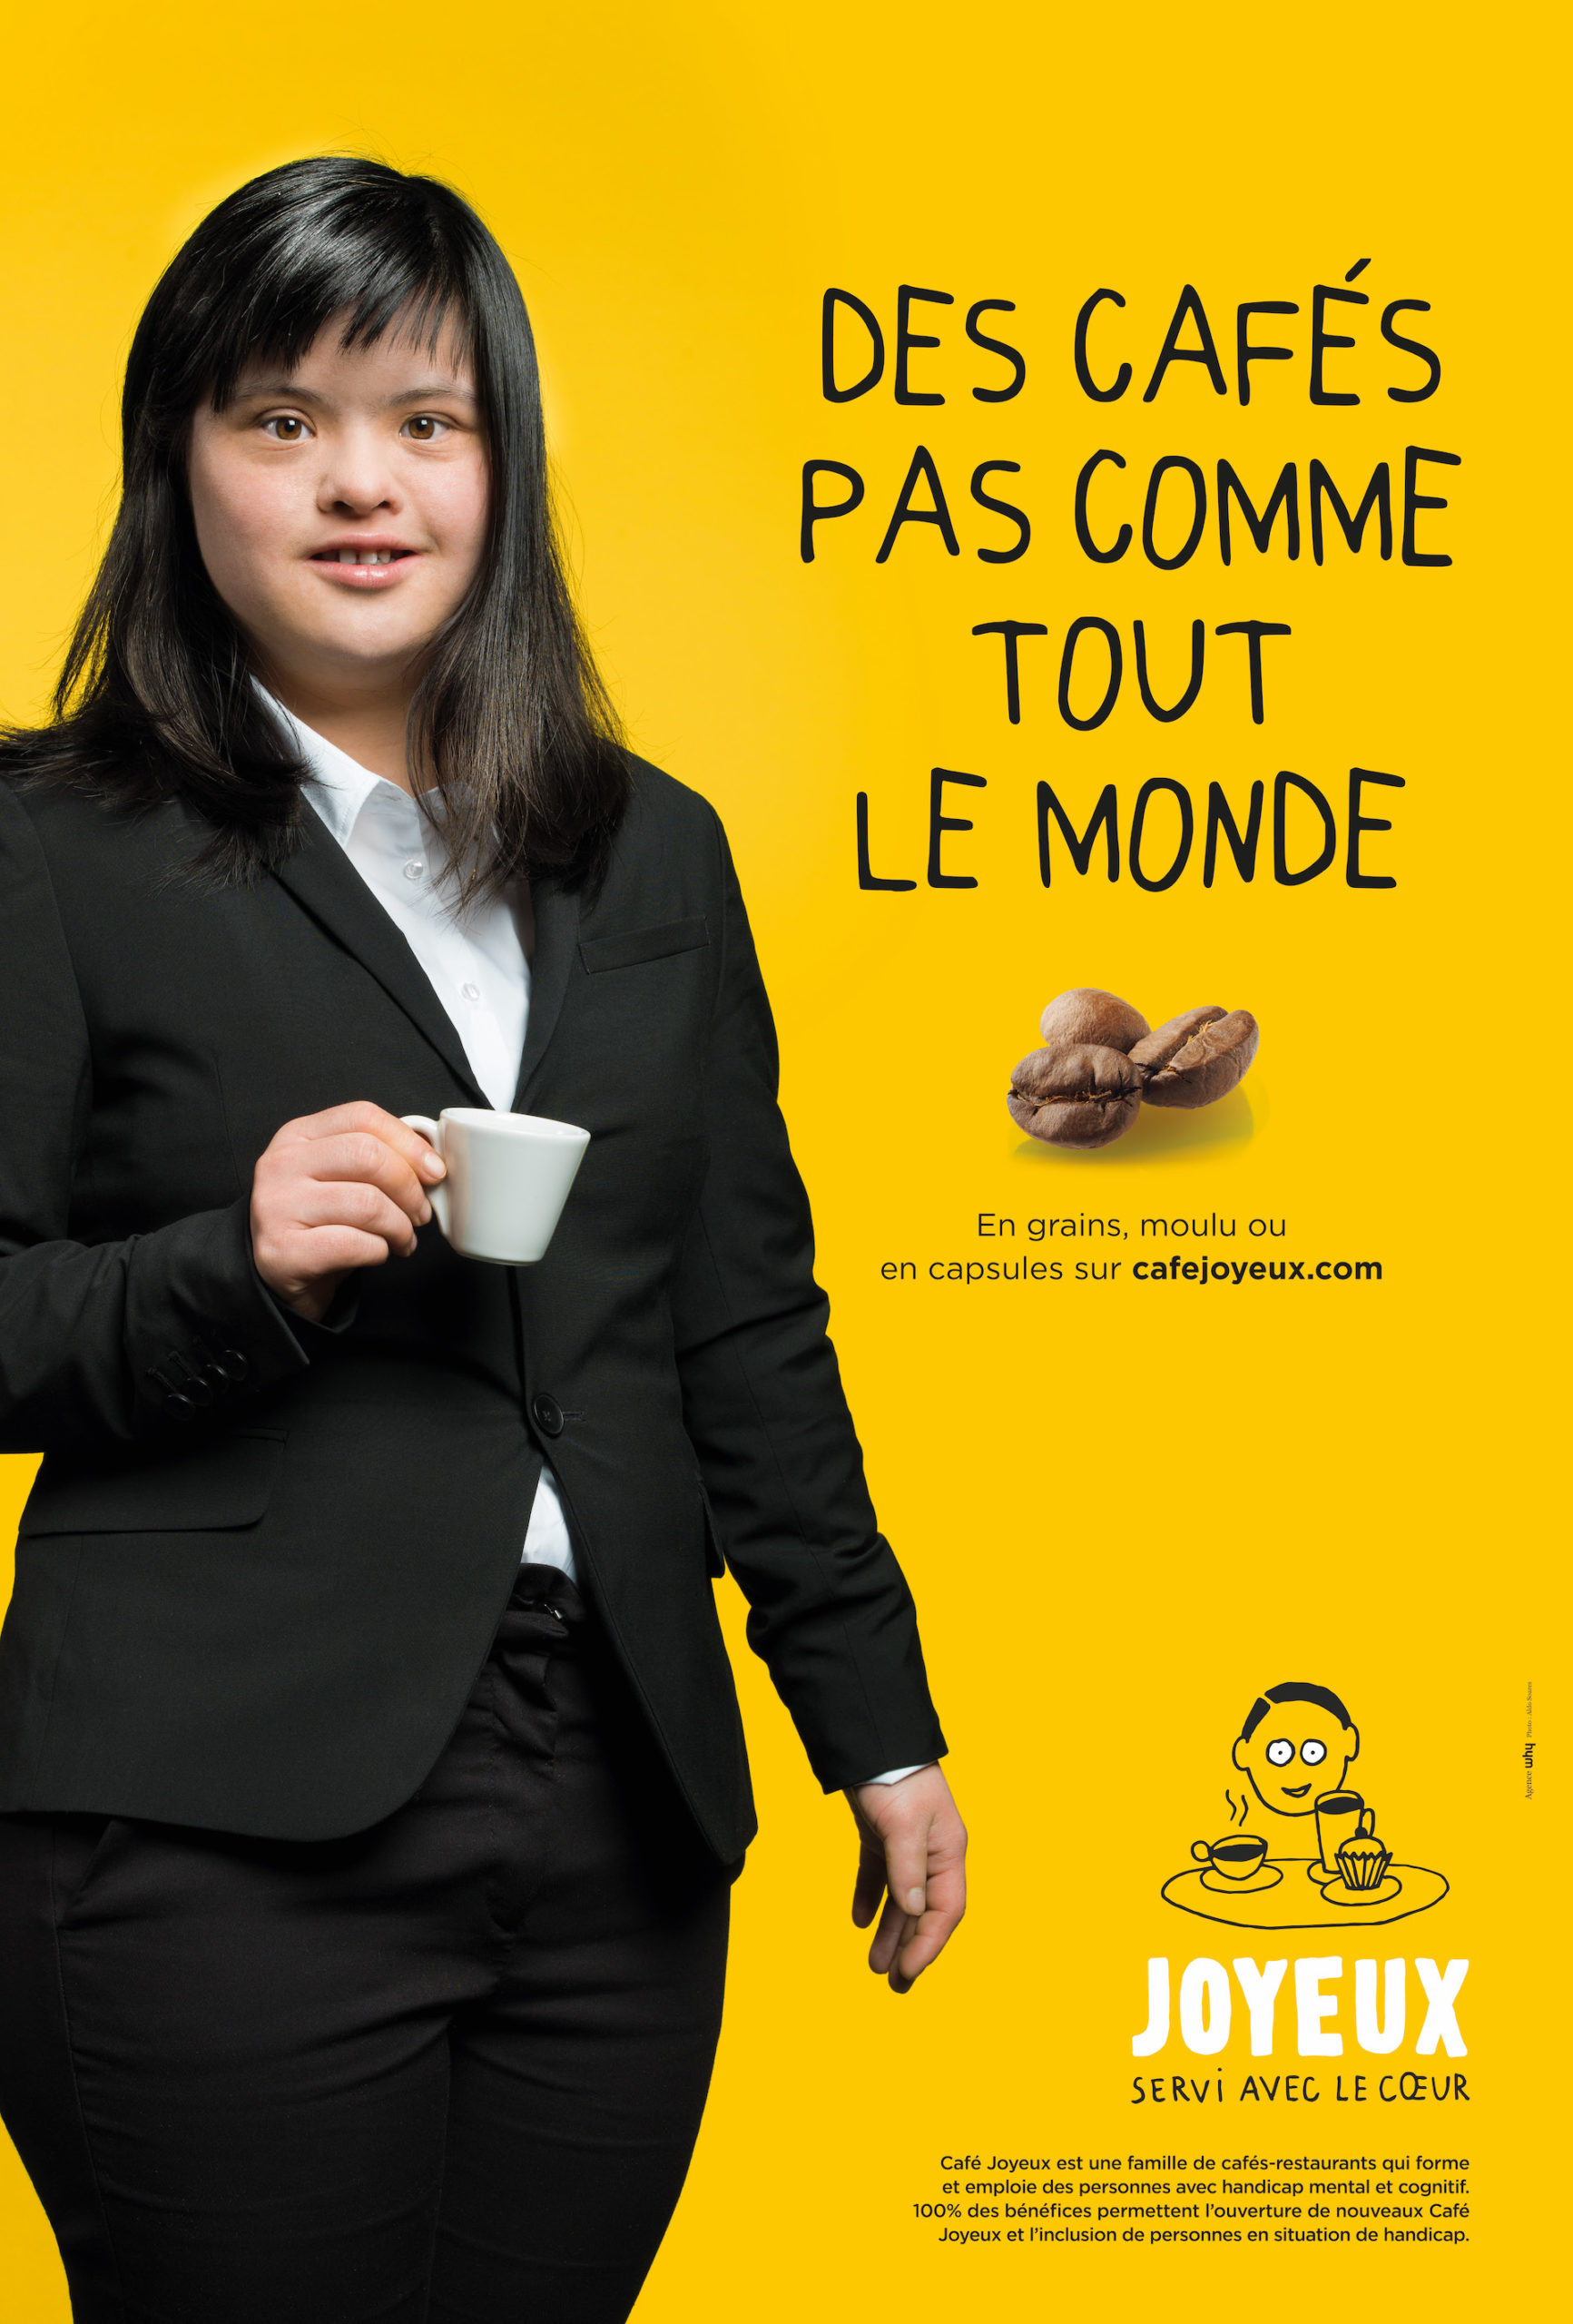 CAFEJOYEUX_AFFICHES_CAFES_2m2_FEV_2020_4